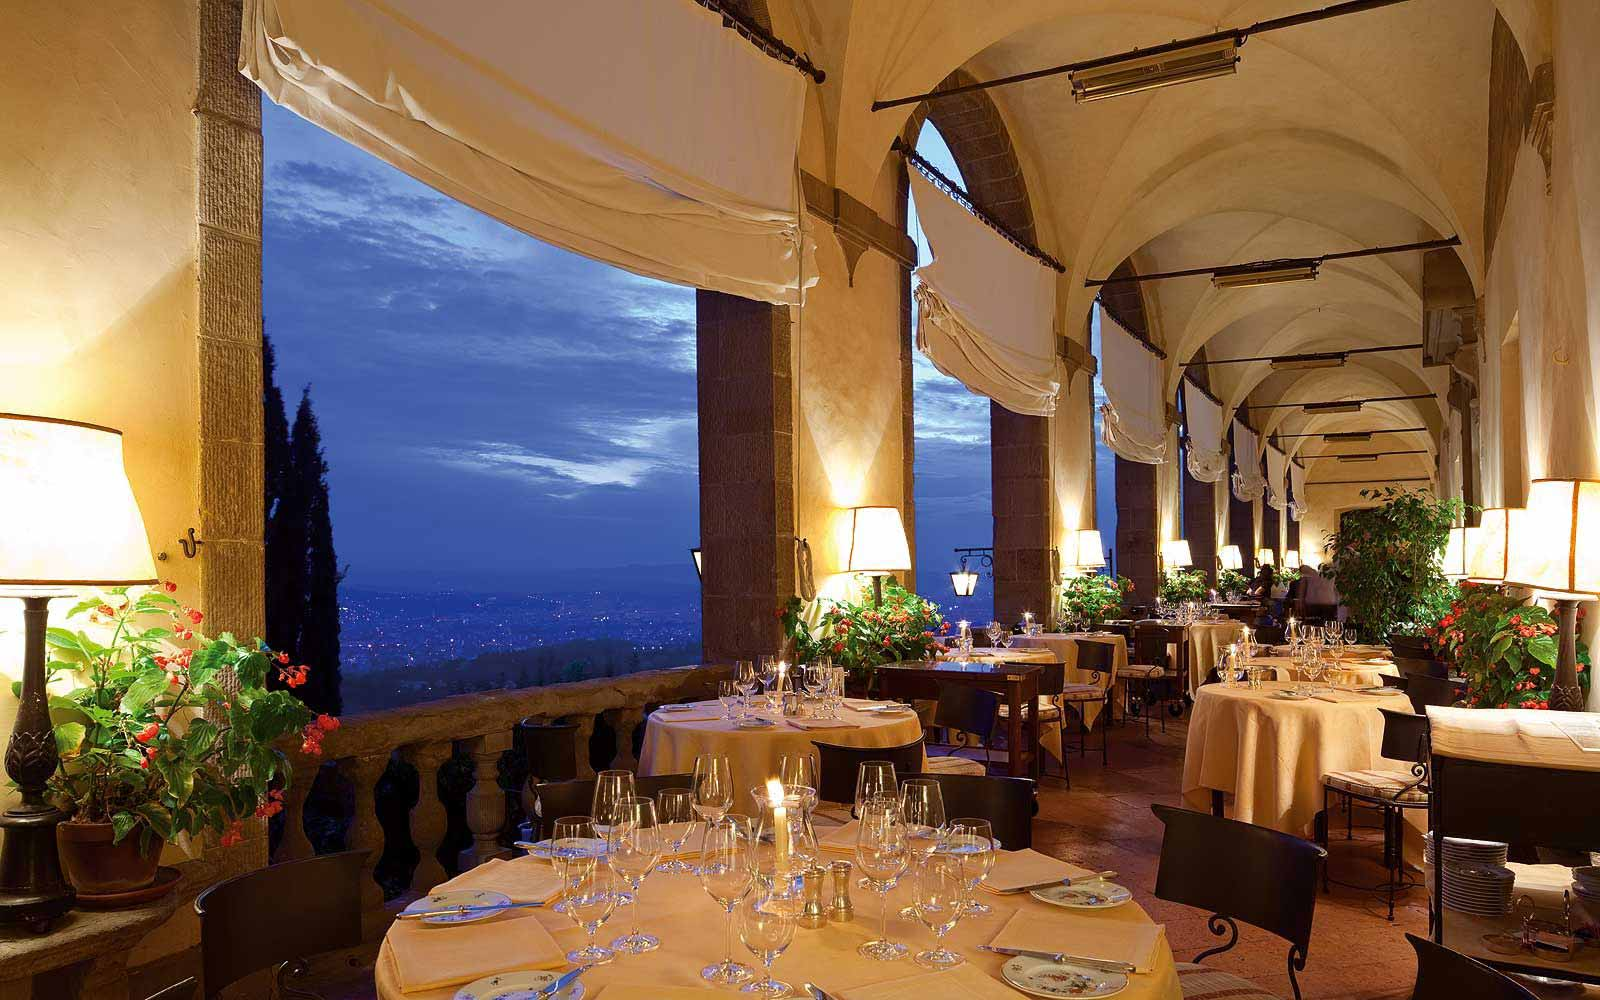 View from the La Loggia Restaurant terrace at Belmond Villa San Michele